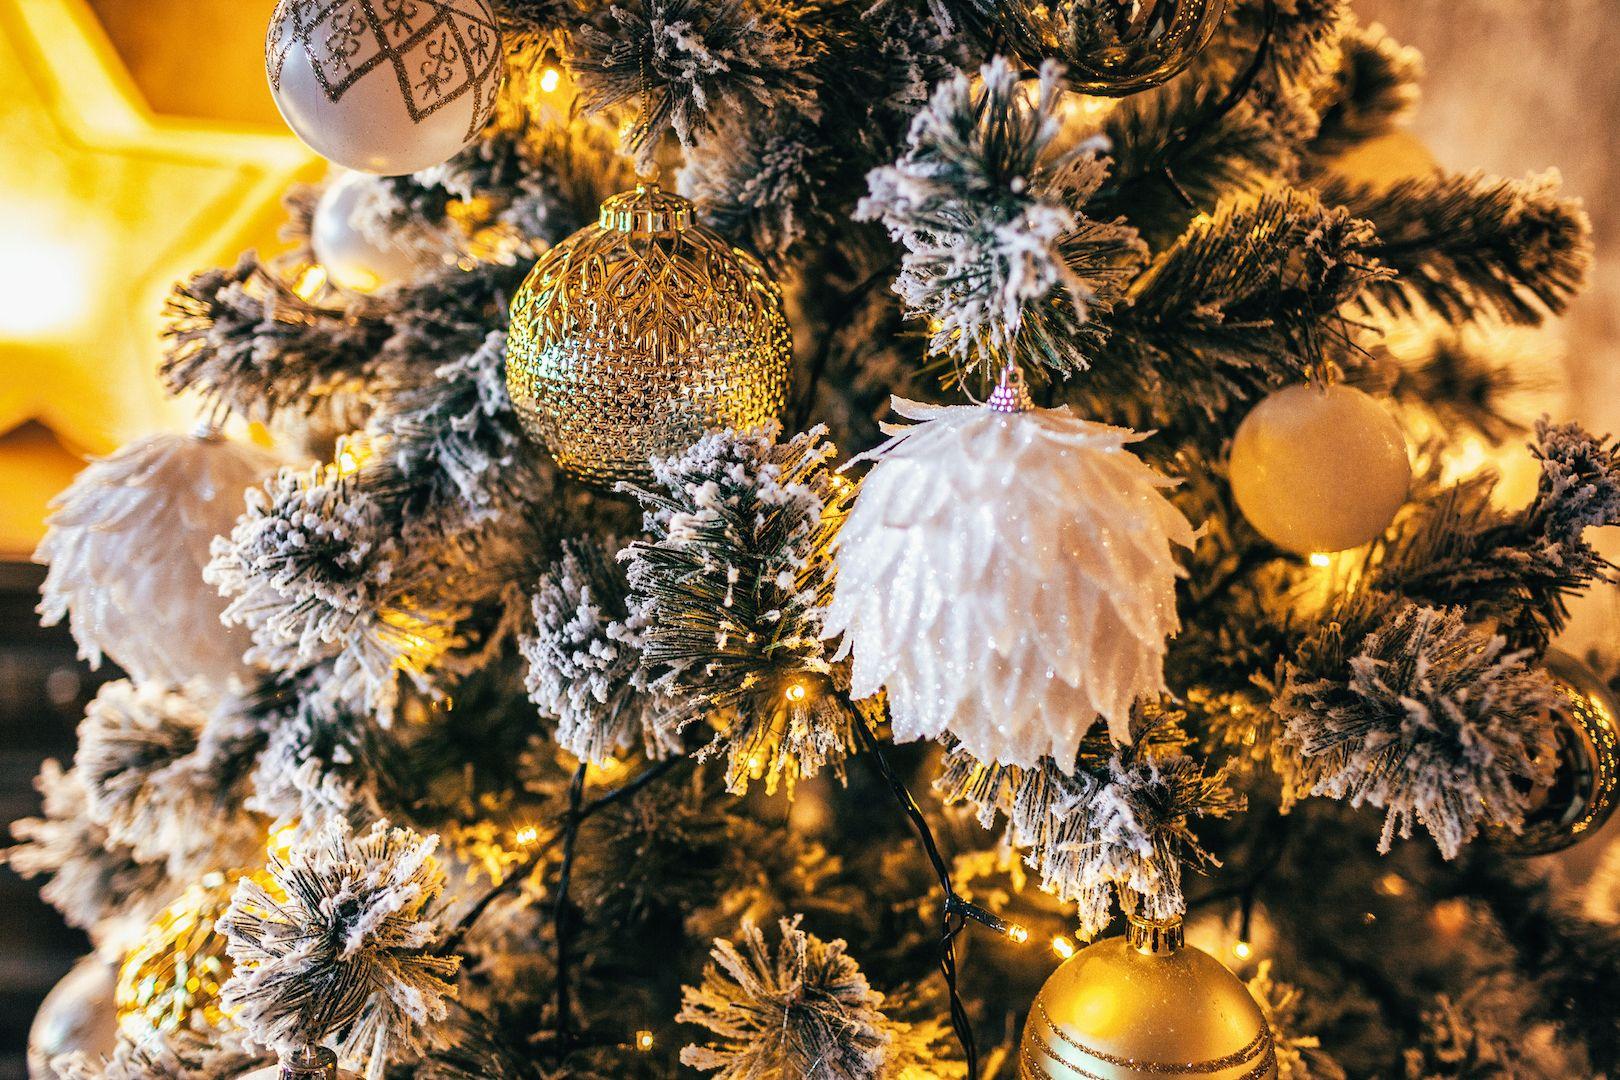 10 Lovely Christmas Tree Theme Ideas - Elegant Themed Christmas Trees